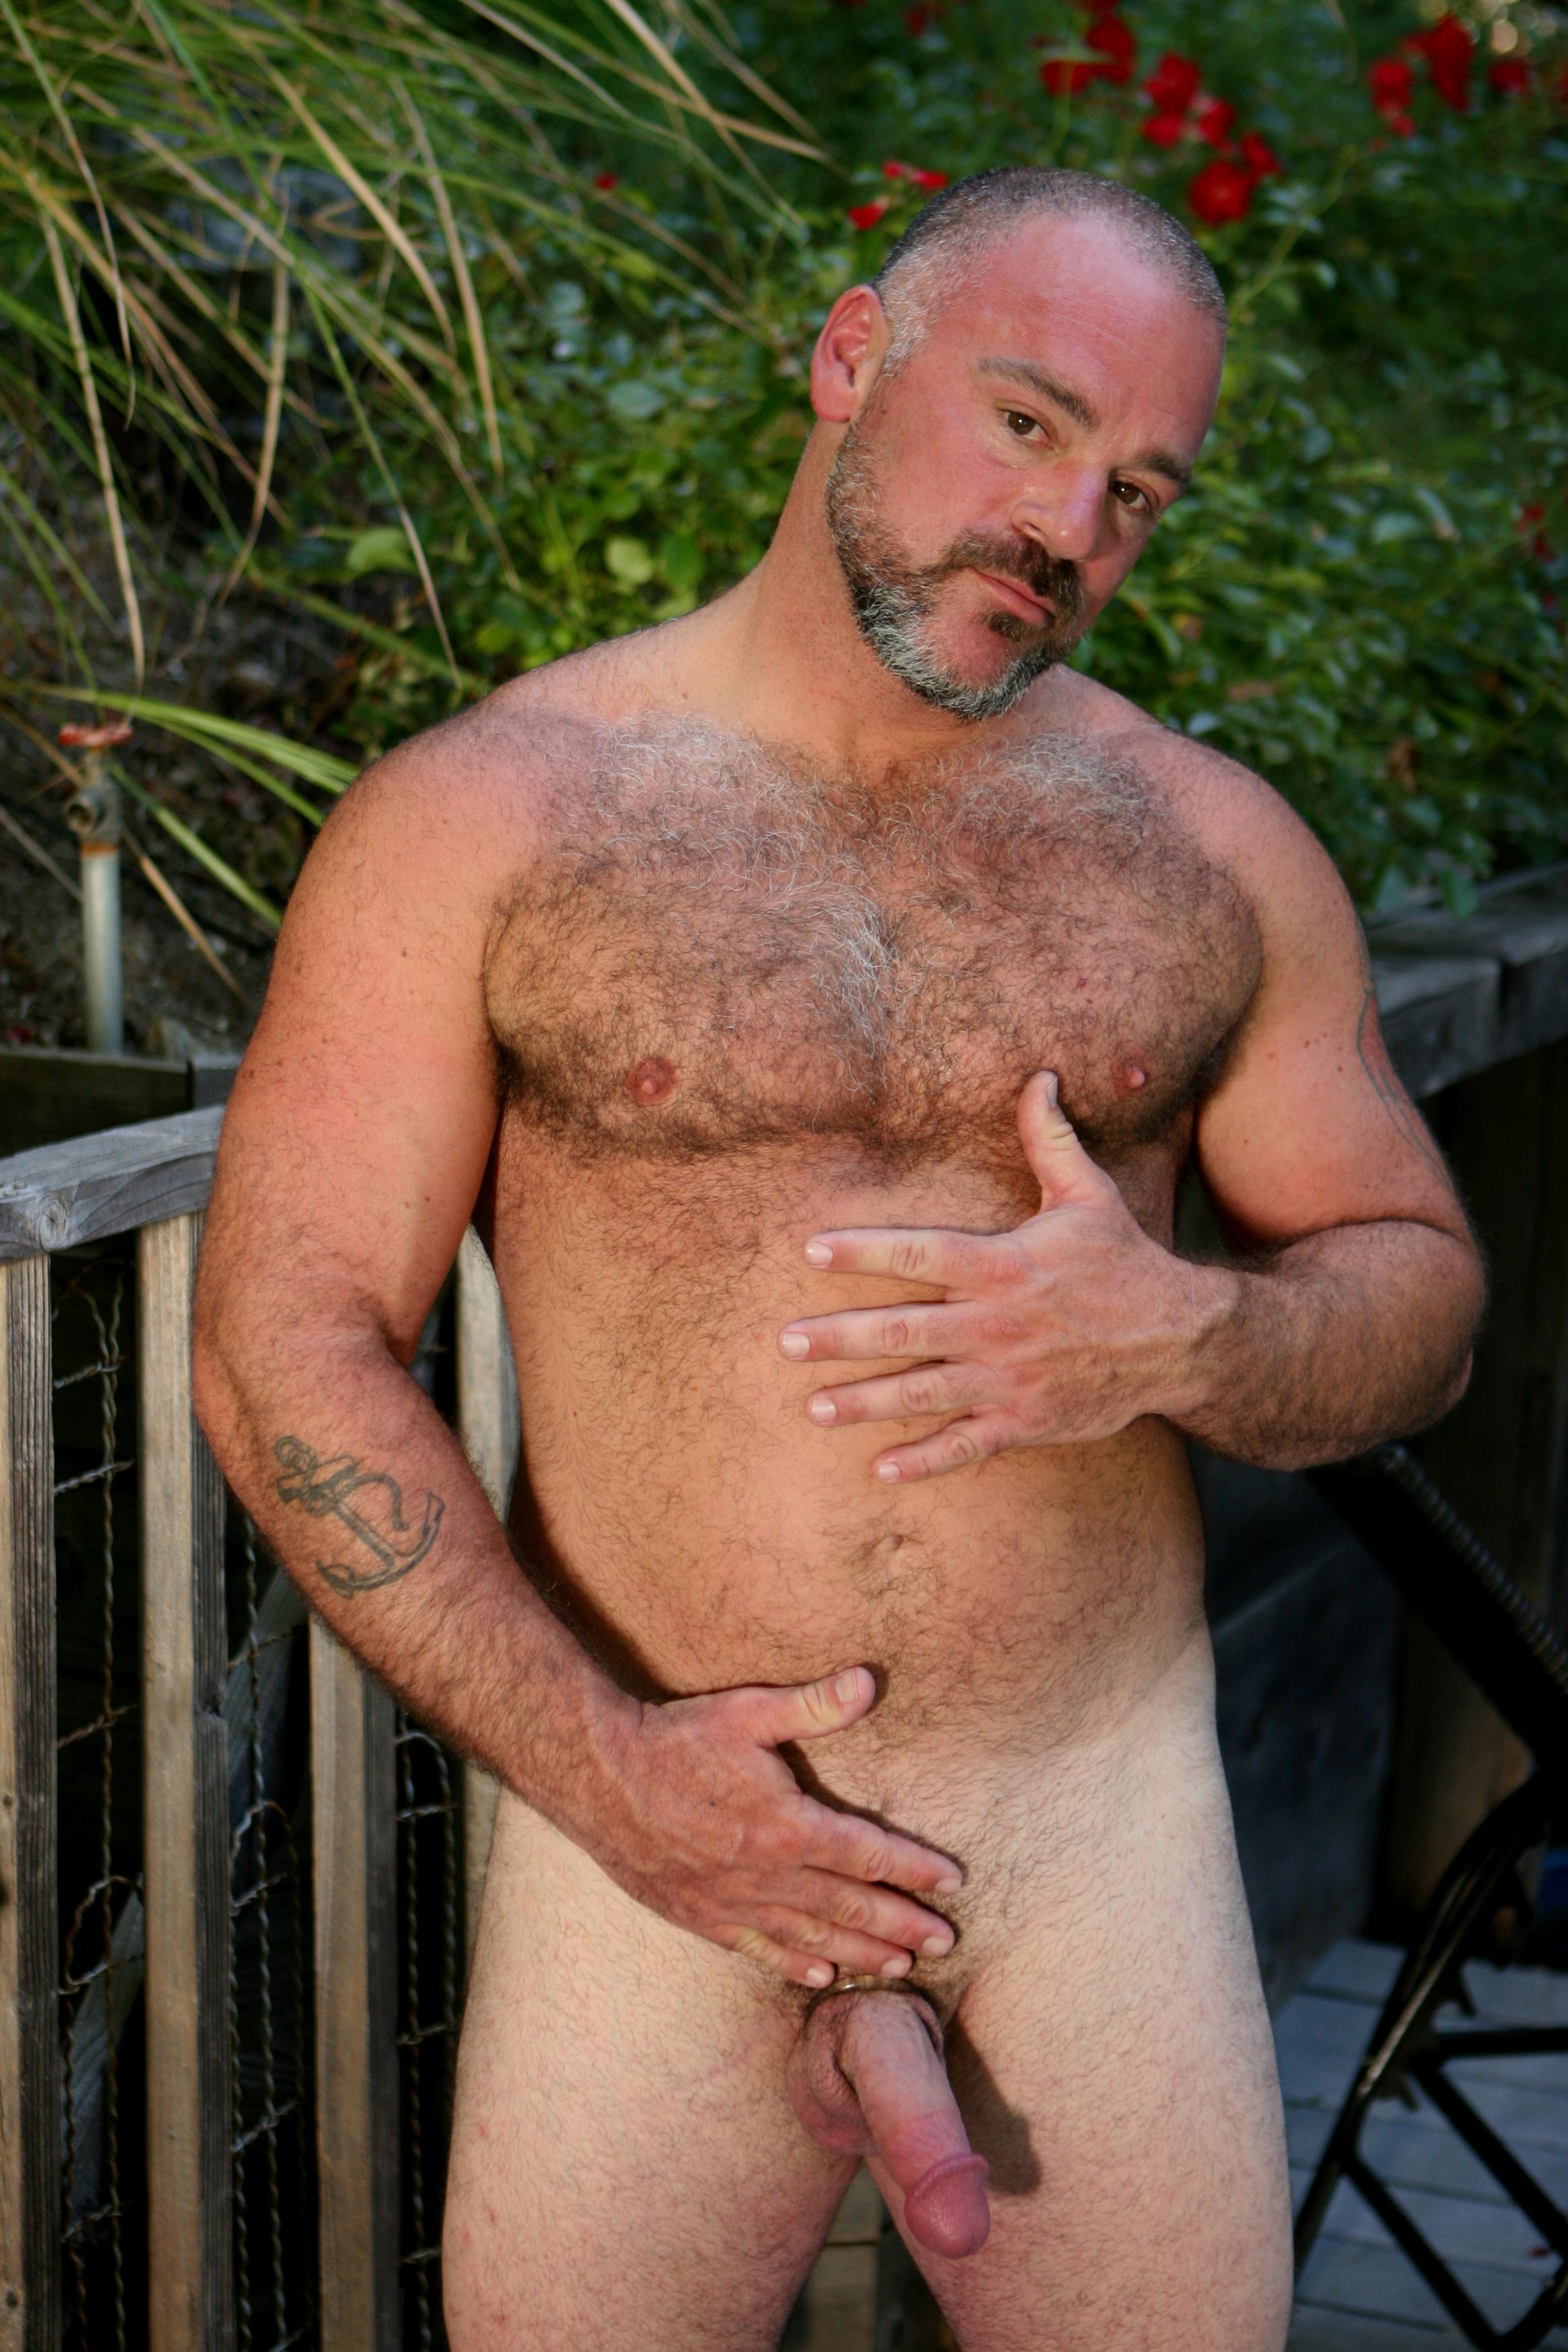 Musclebound Hunk Enjoying Blowjob Outdoors